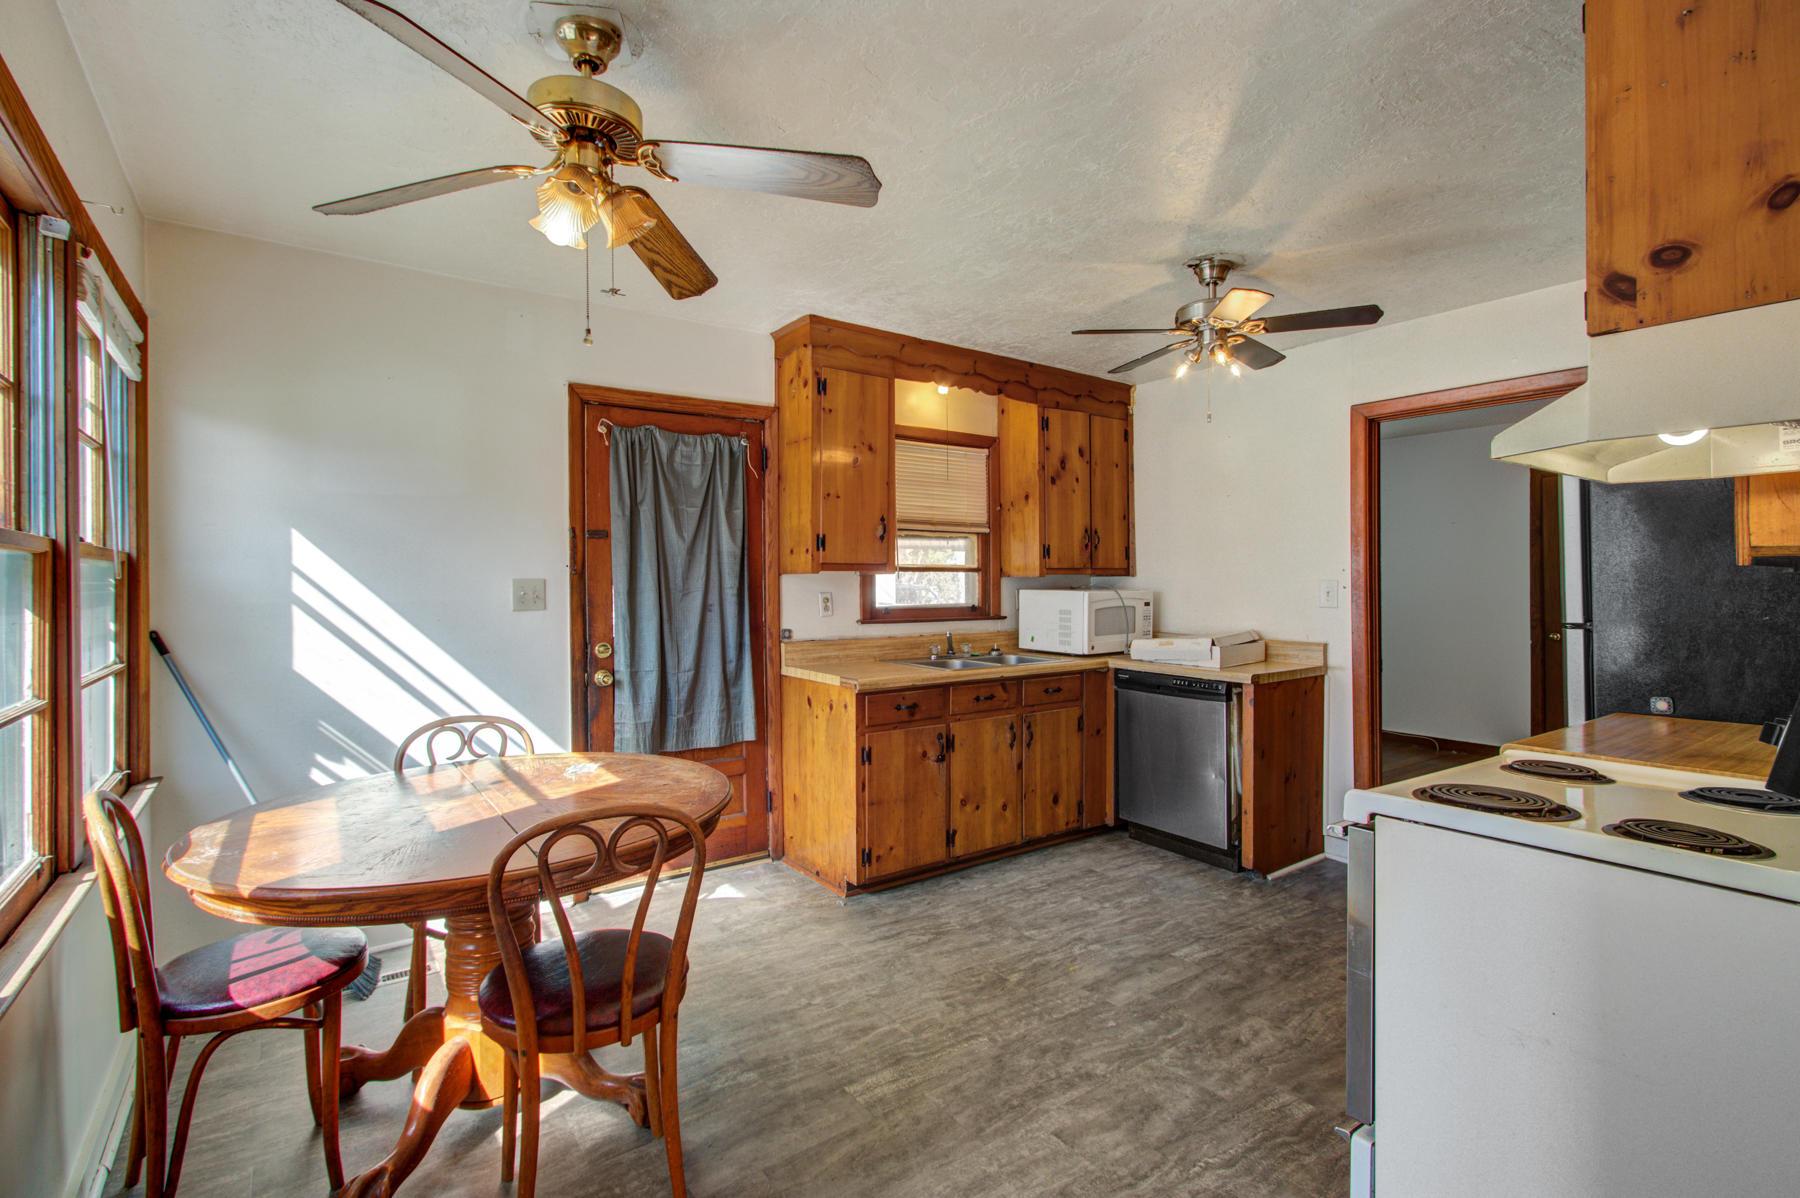 Port Park Homes For Sale - 5814 Moore, Hanahan, SC - 22